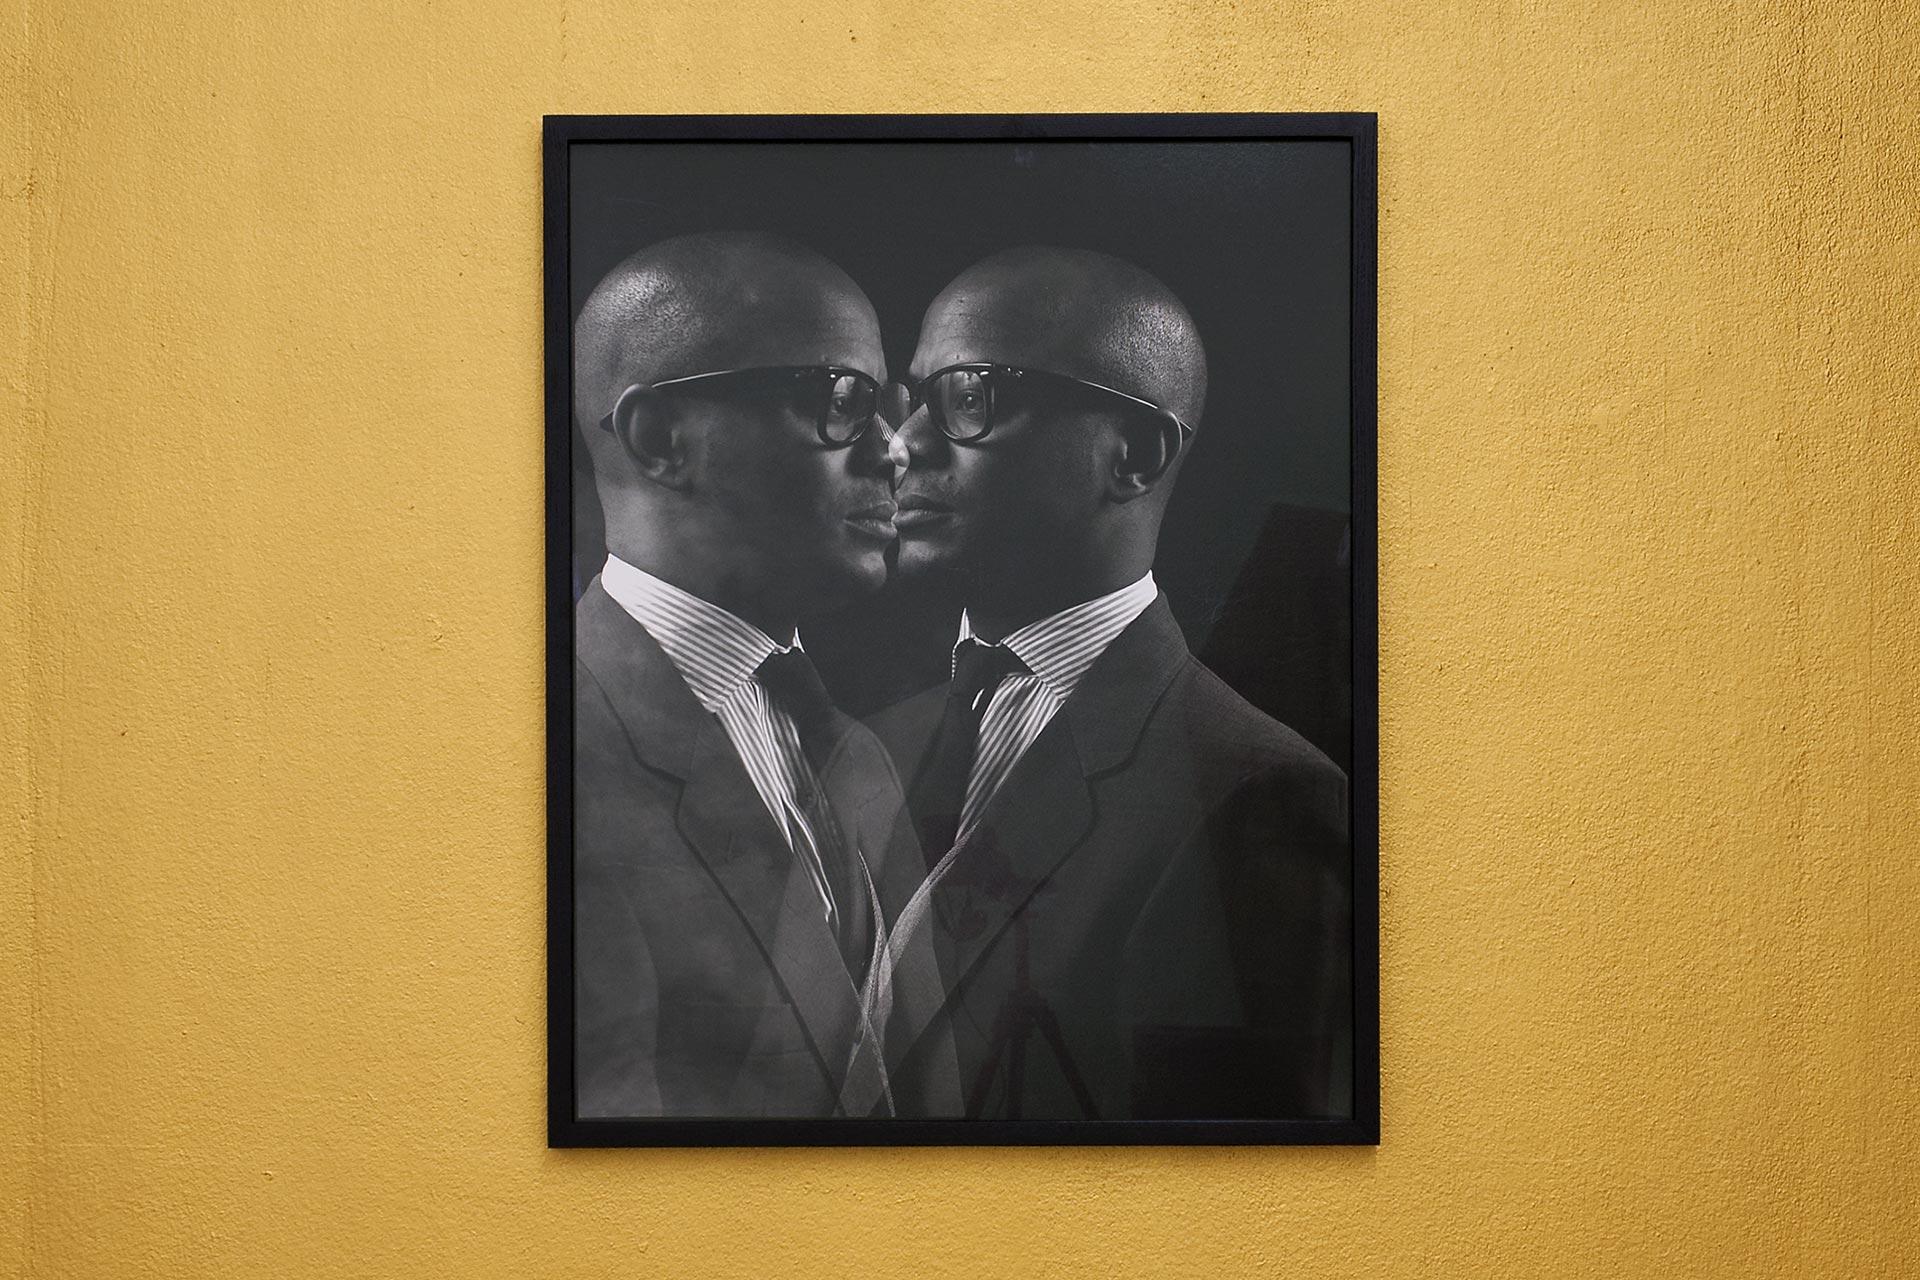 Rashid-Johnson-Kunsthalle-Winterthur-2014-4.jpg